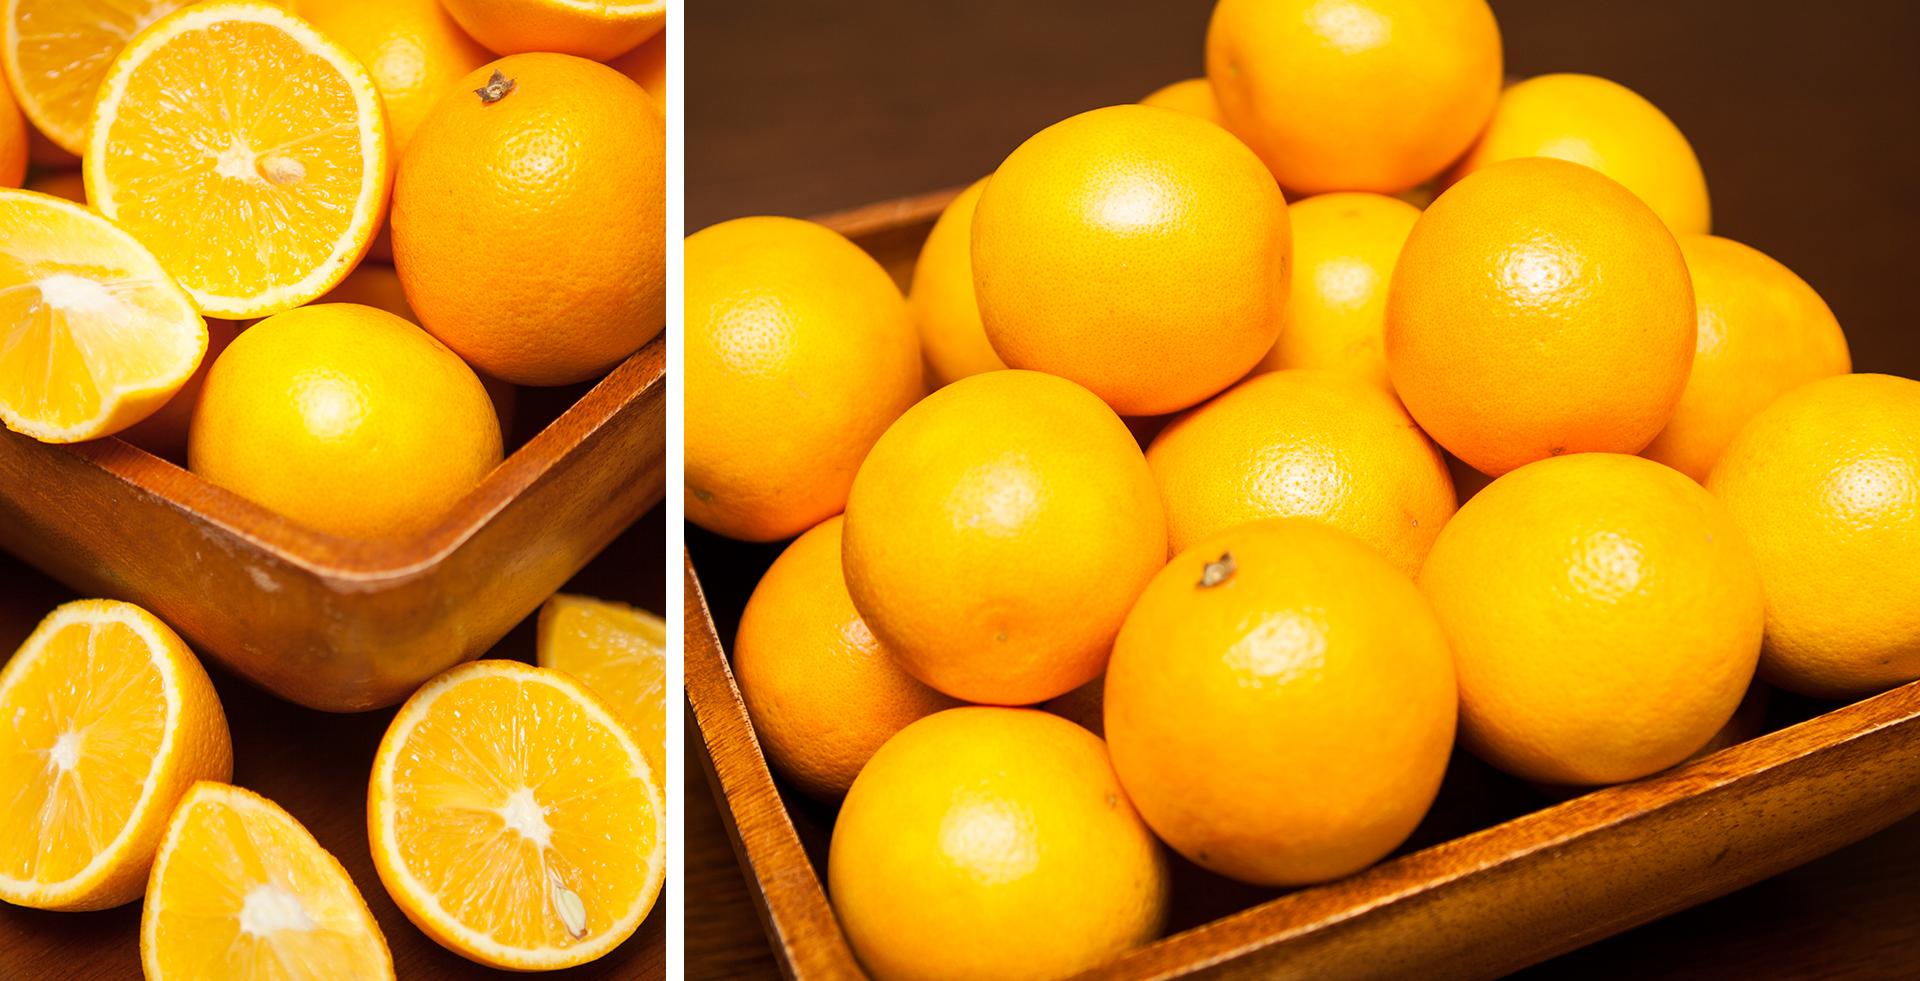 Orange Bell Oranges_rcfdistributors